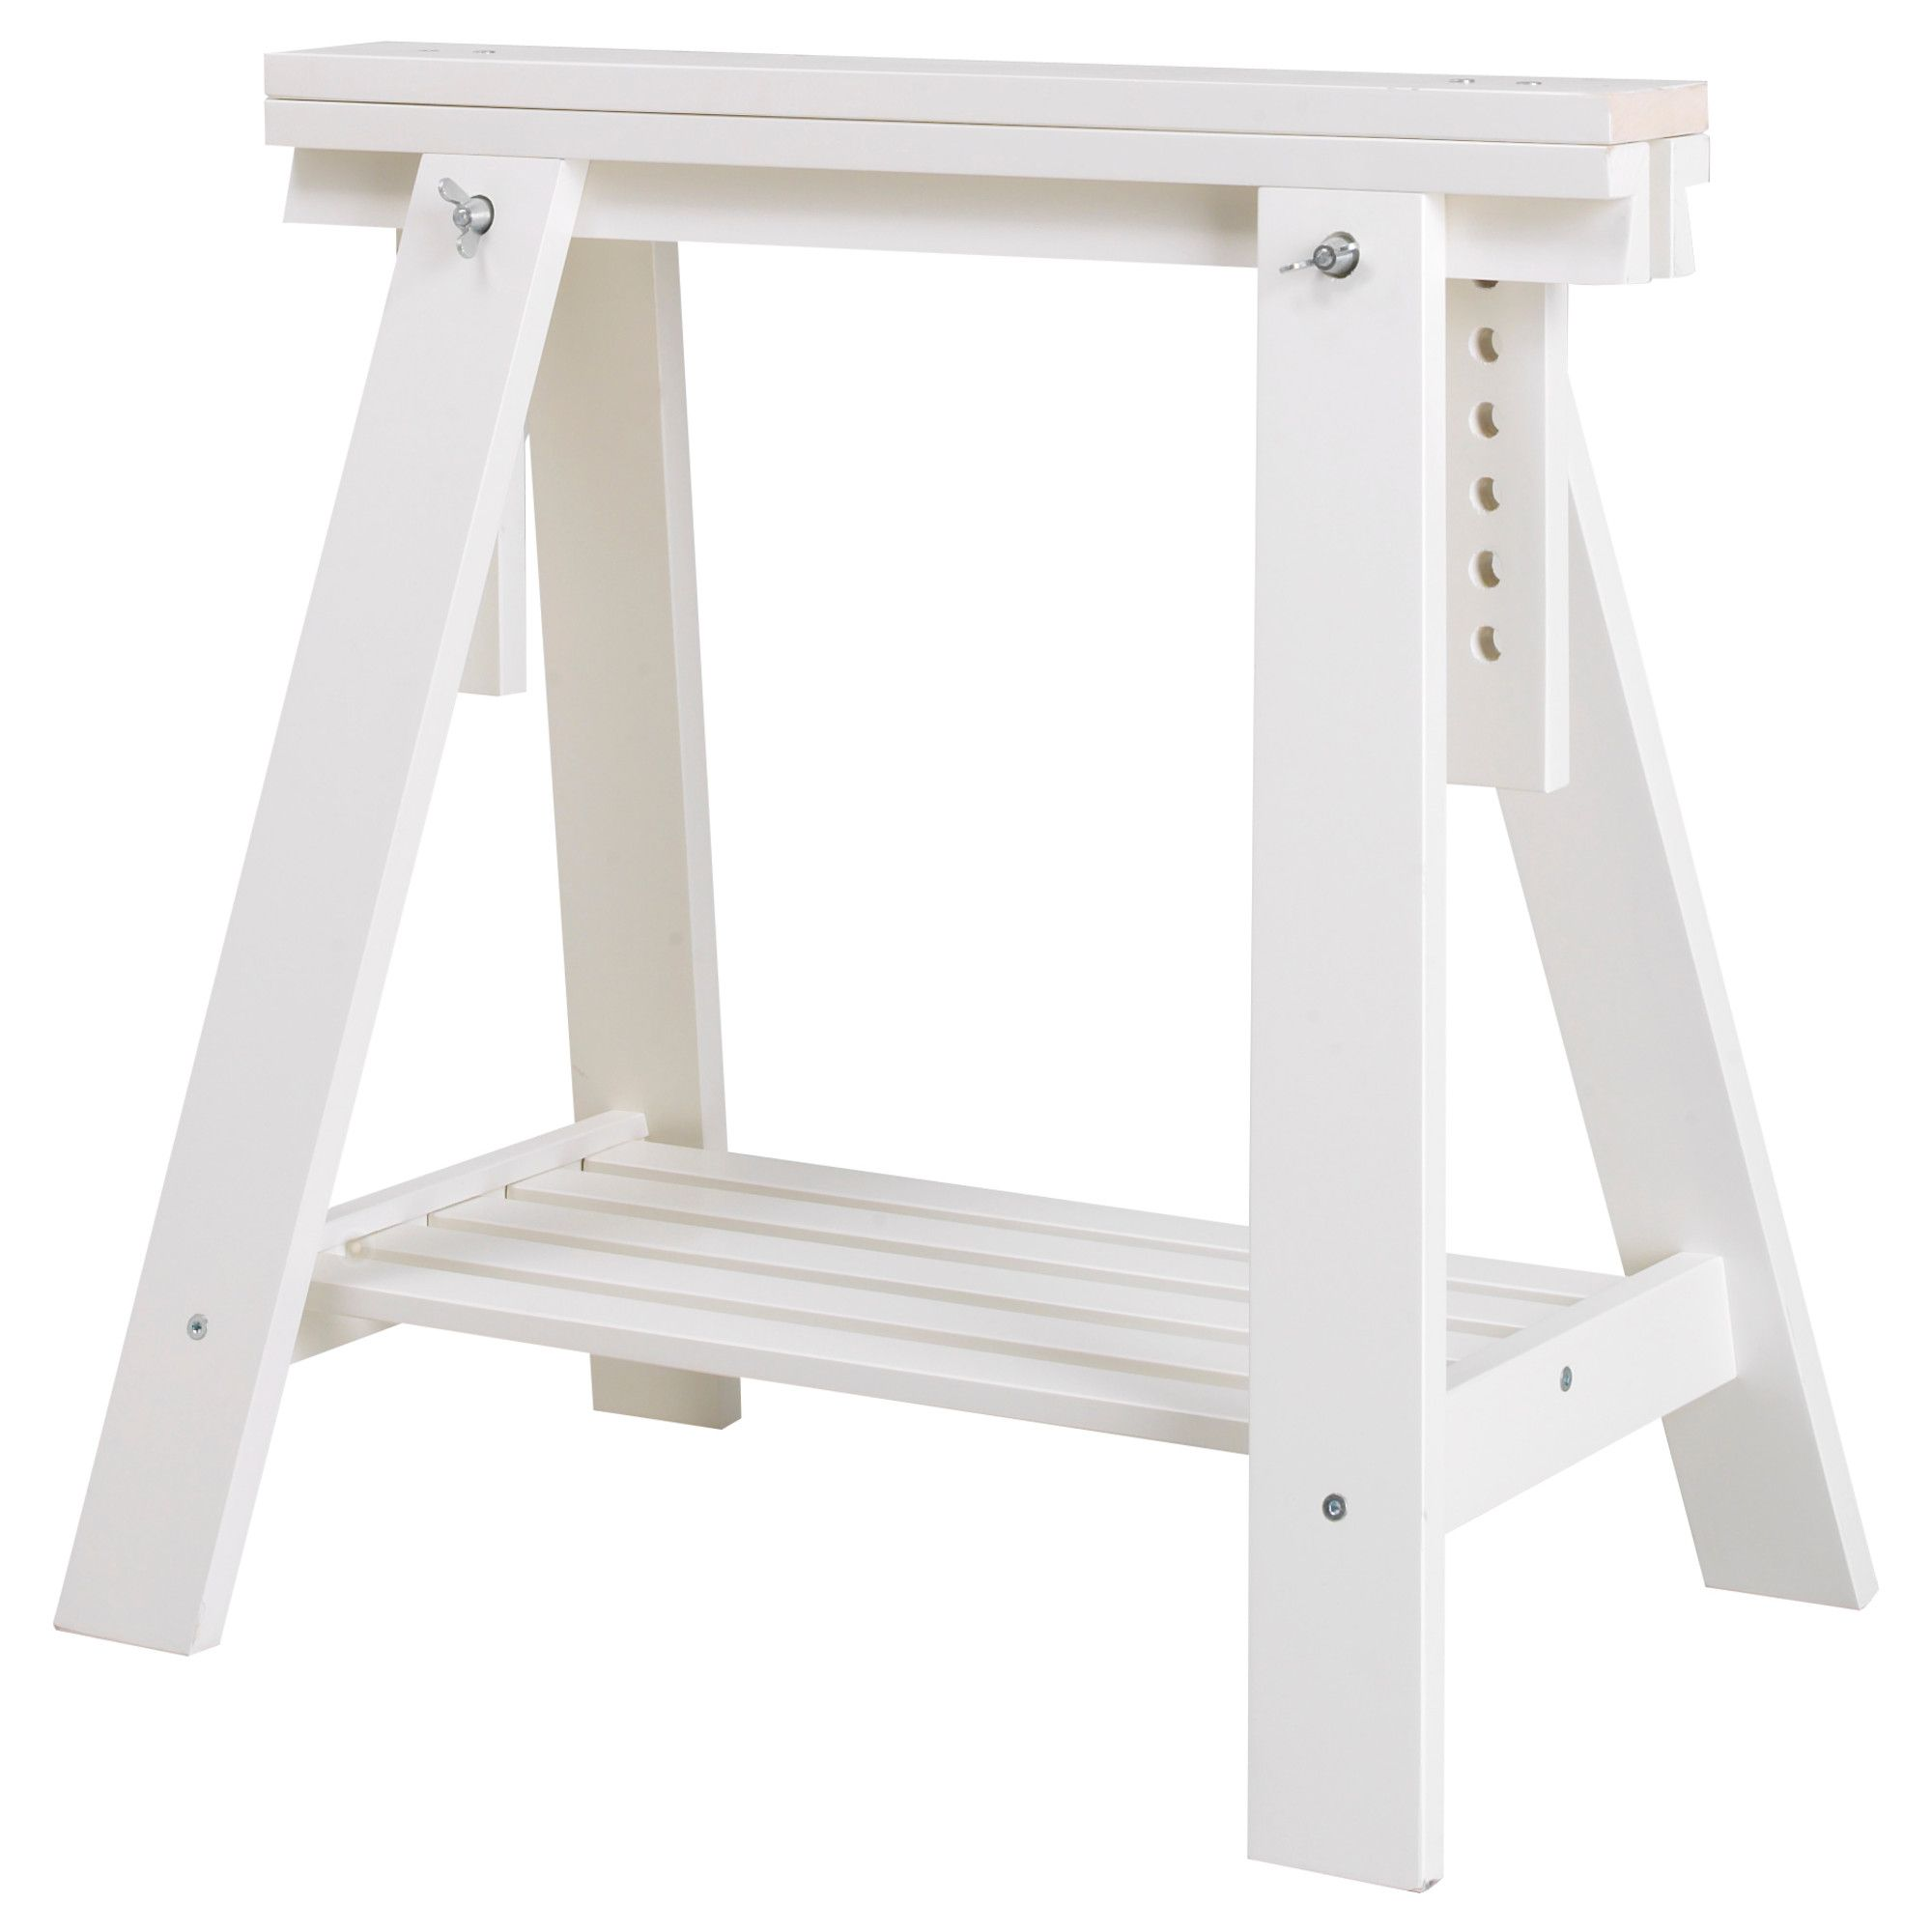 Love Them For My New Desk Legs Finnvard Trestle With Shelf White Ikea 70 X 71 93 Cm 25